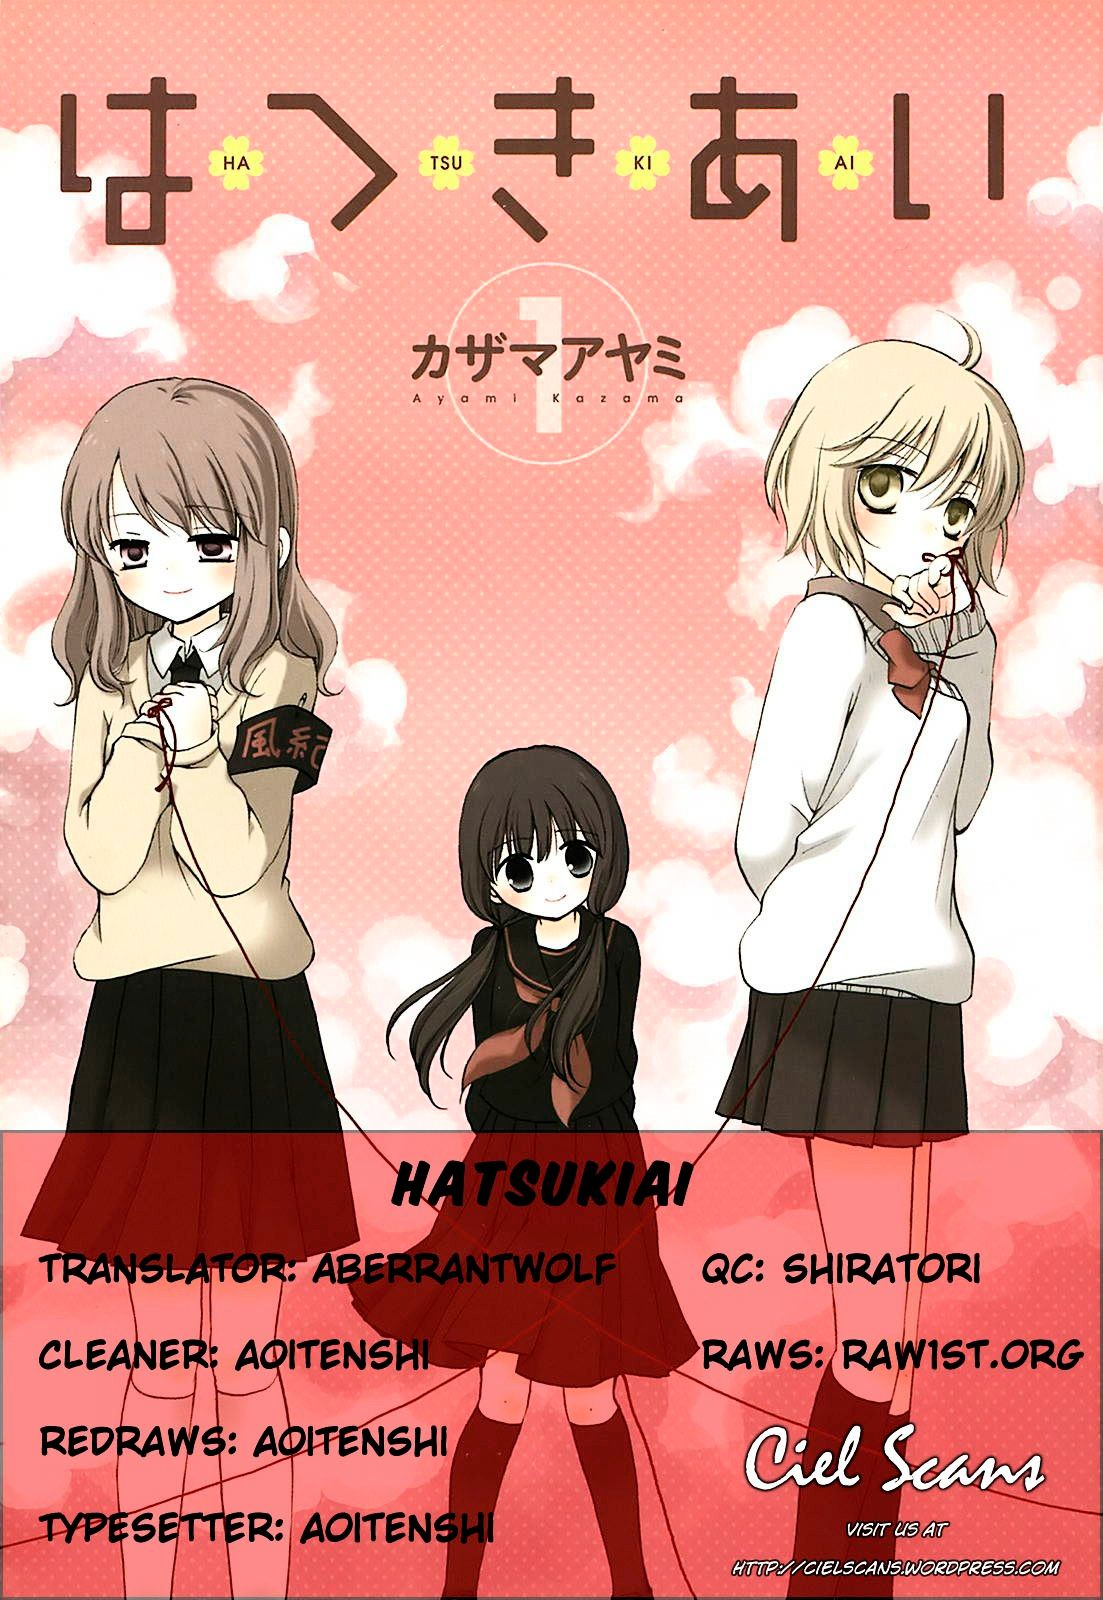 Hatsukiai: The Buds of First Love